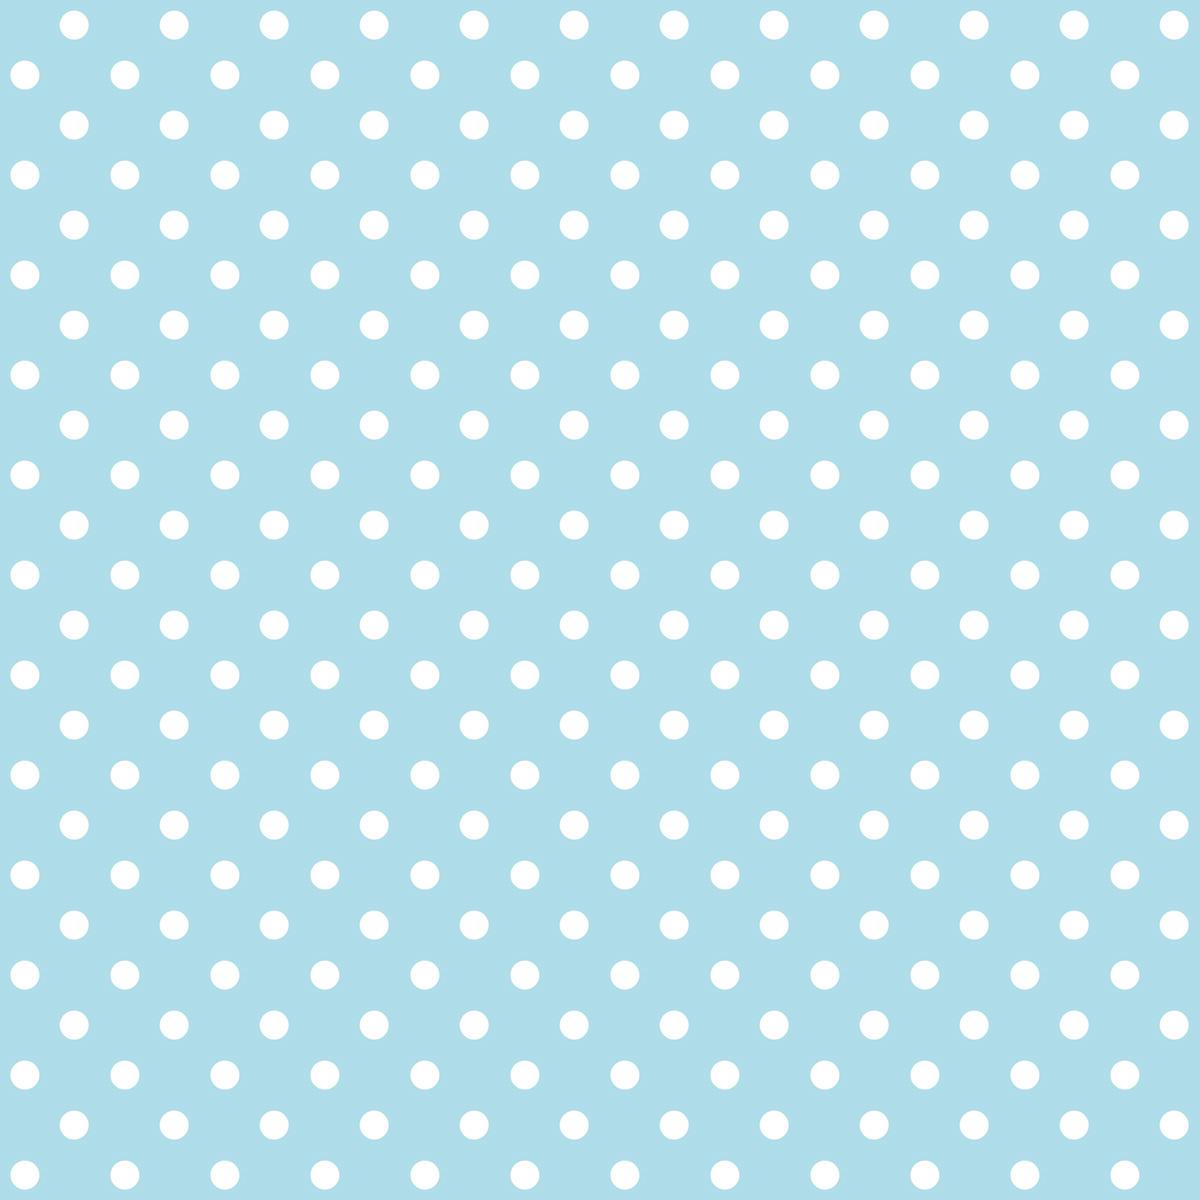 Blue Polka Dot Backgrounds